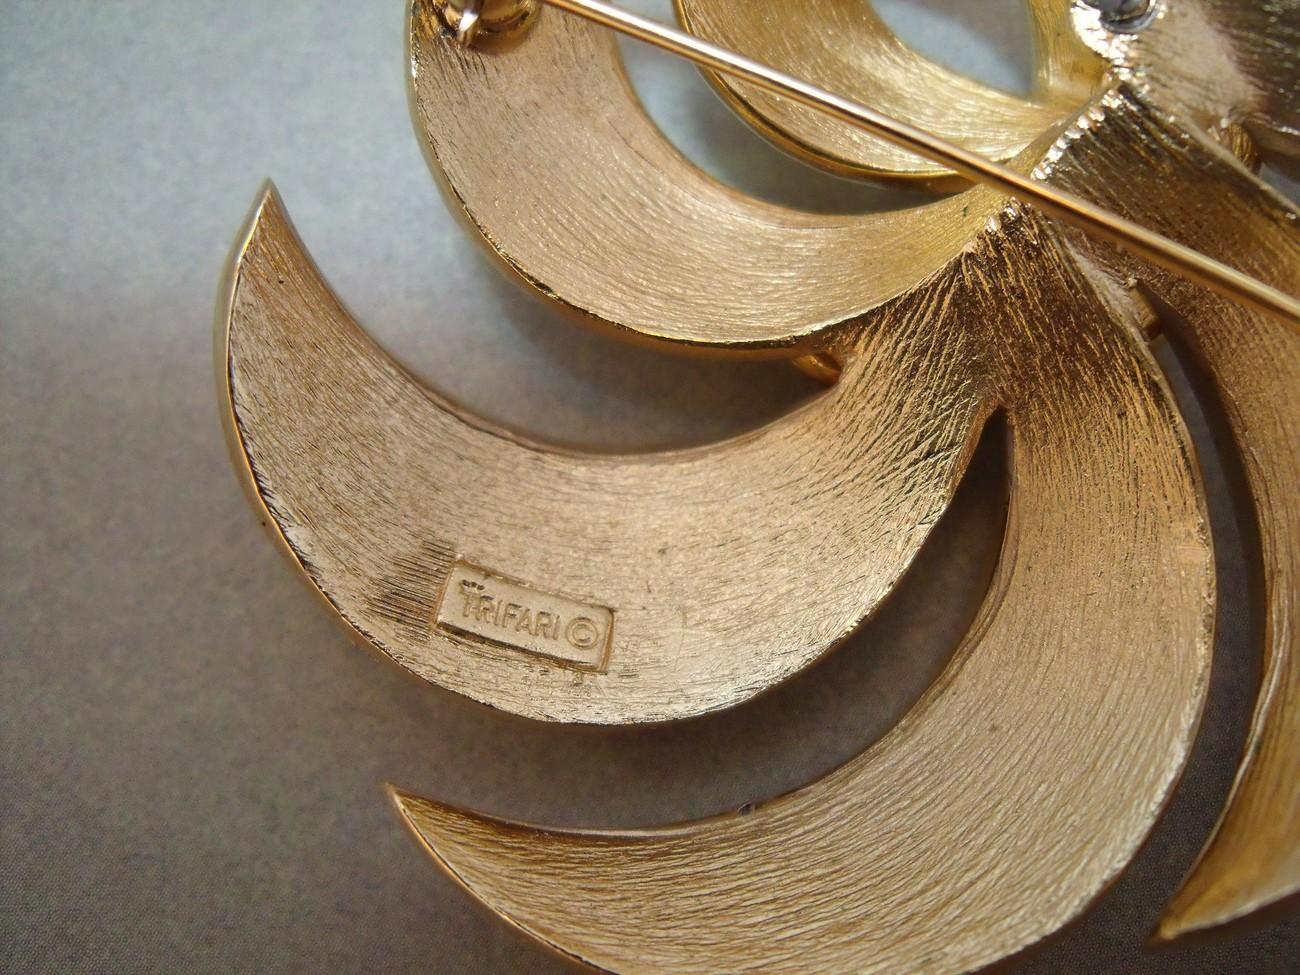 Vintage Crown Trifari white enamel swirl circle brooch